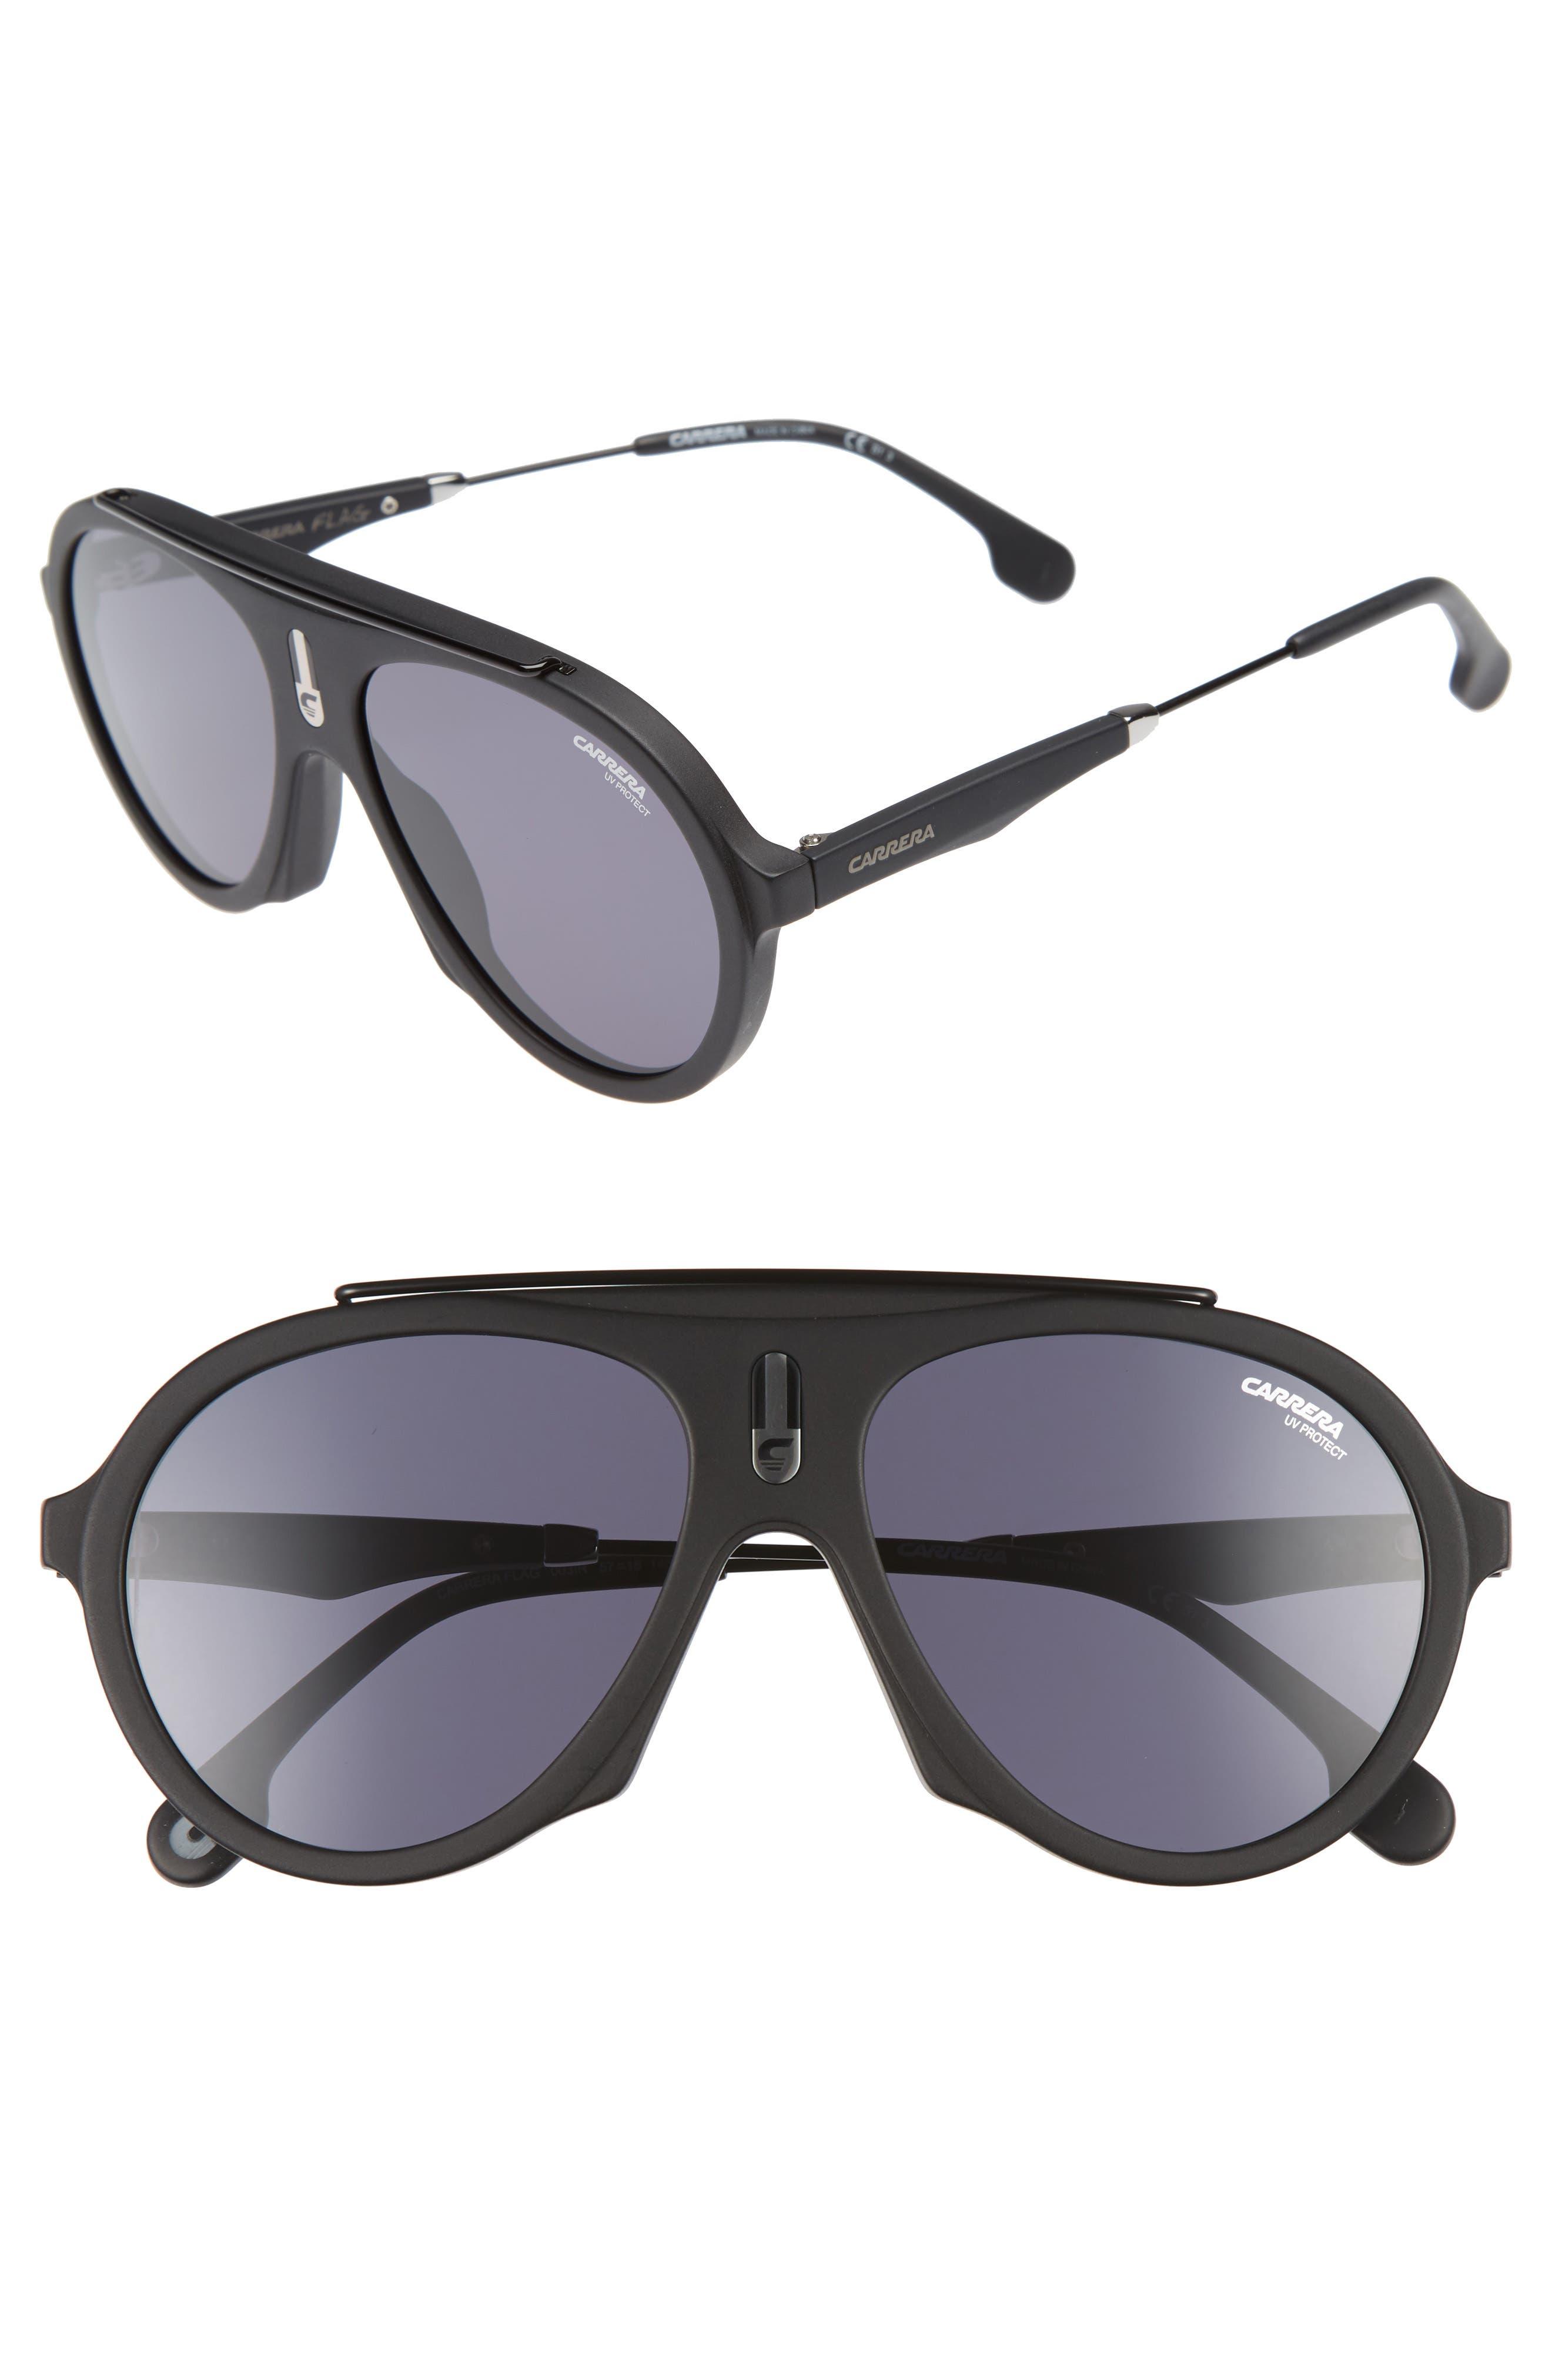 Alternate Image 1 Selected - Carrera Flag 57mm Mirrored Pilot Sunglasses